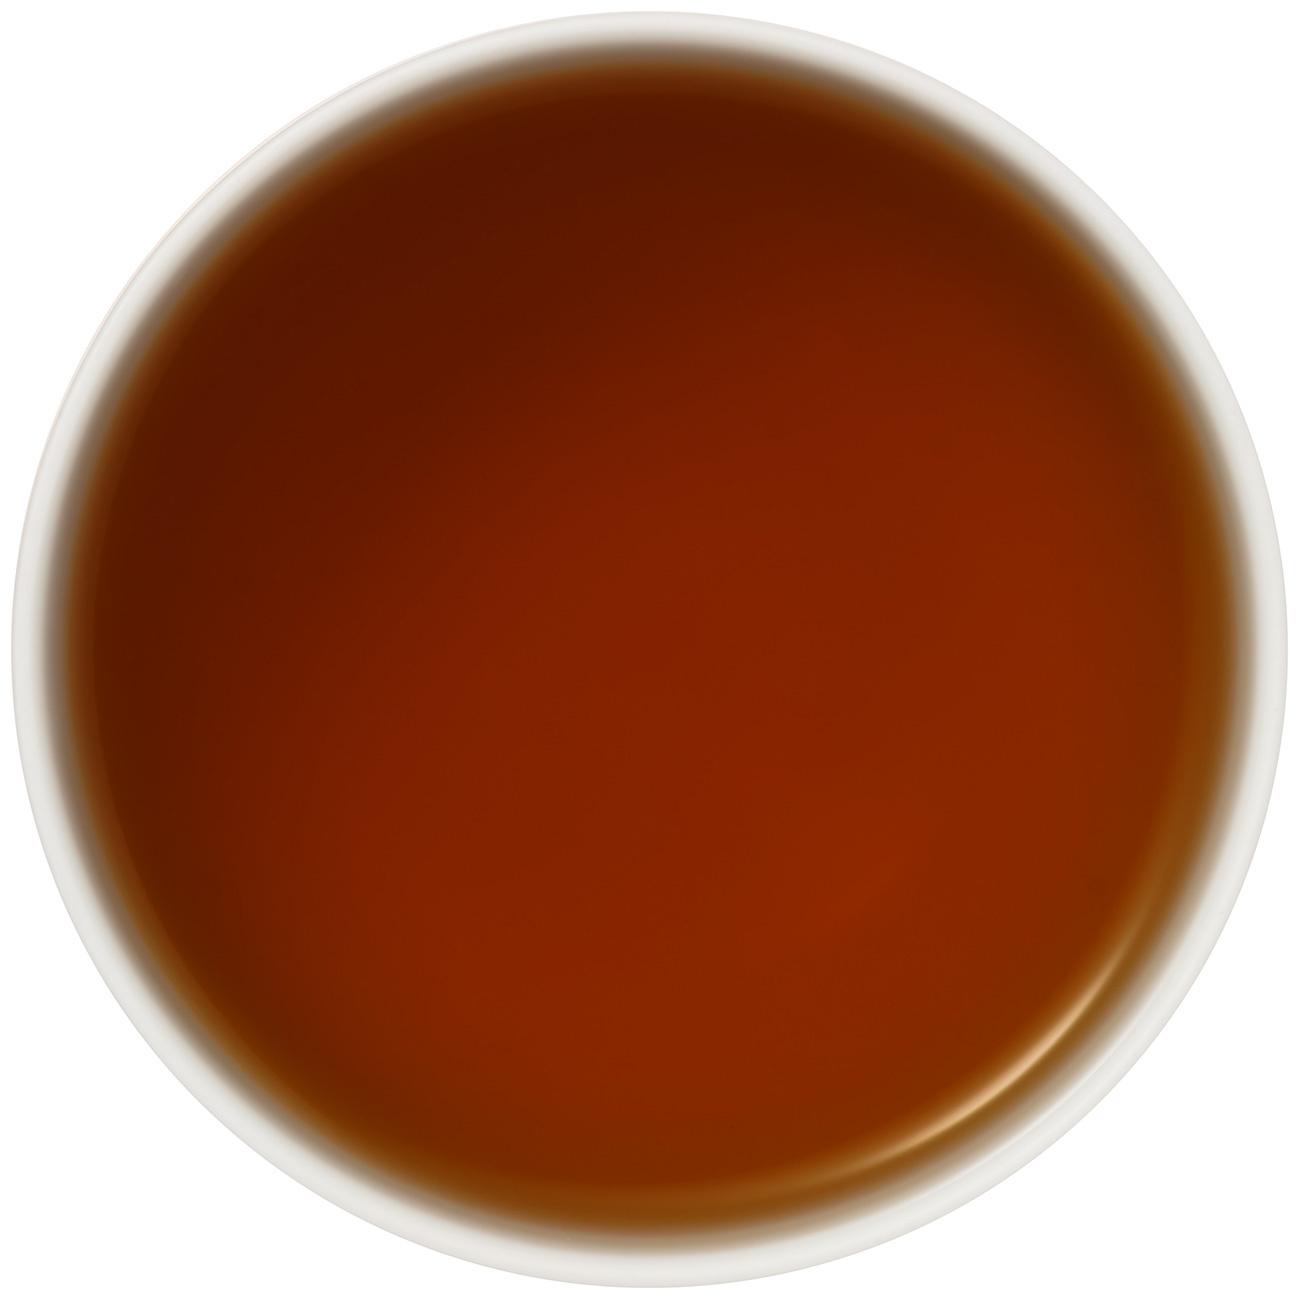 Maracuja Passievrucht thee-3